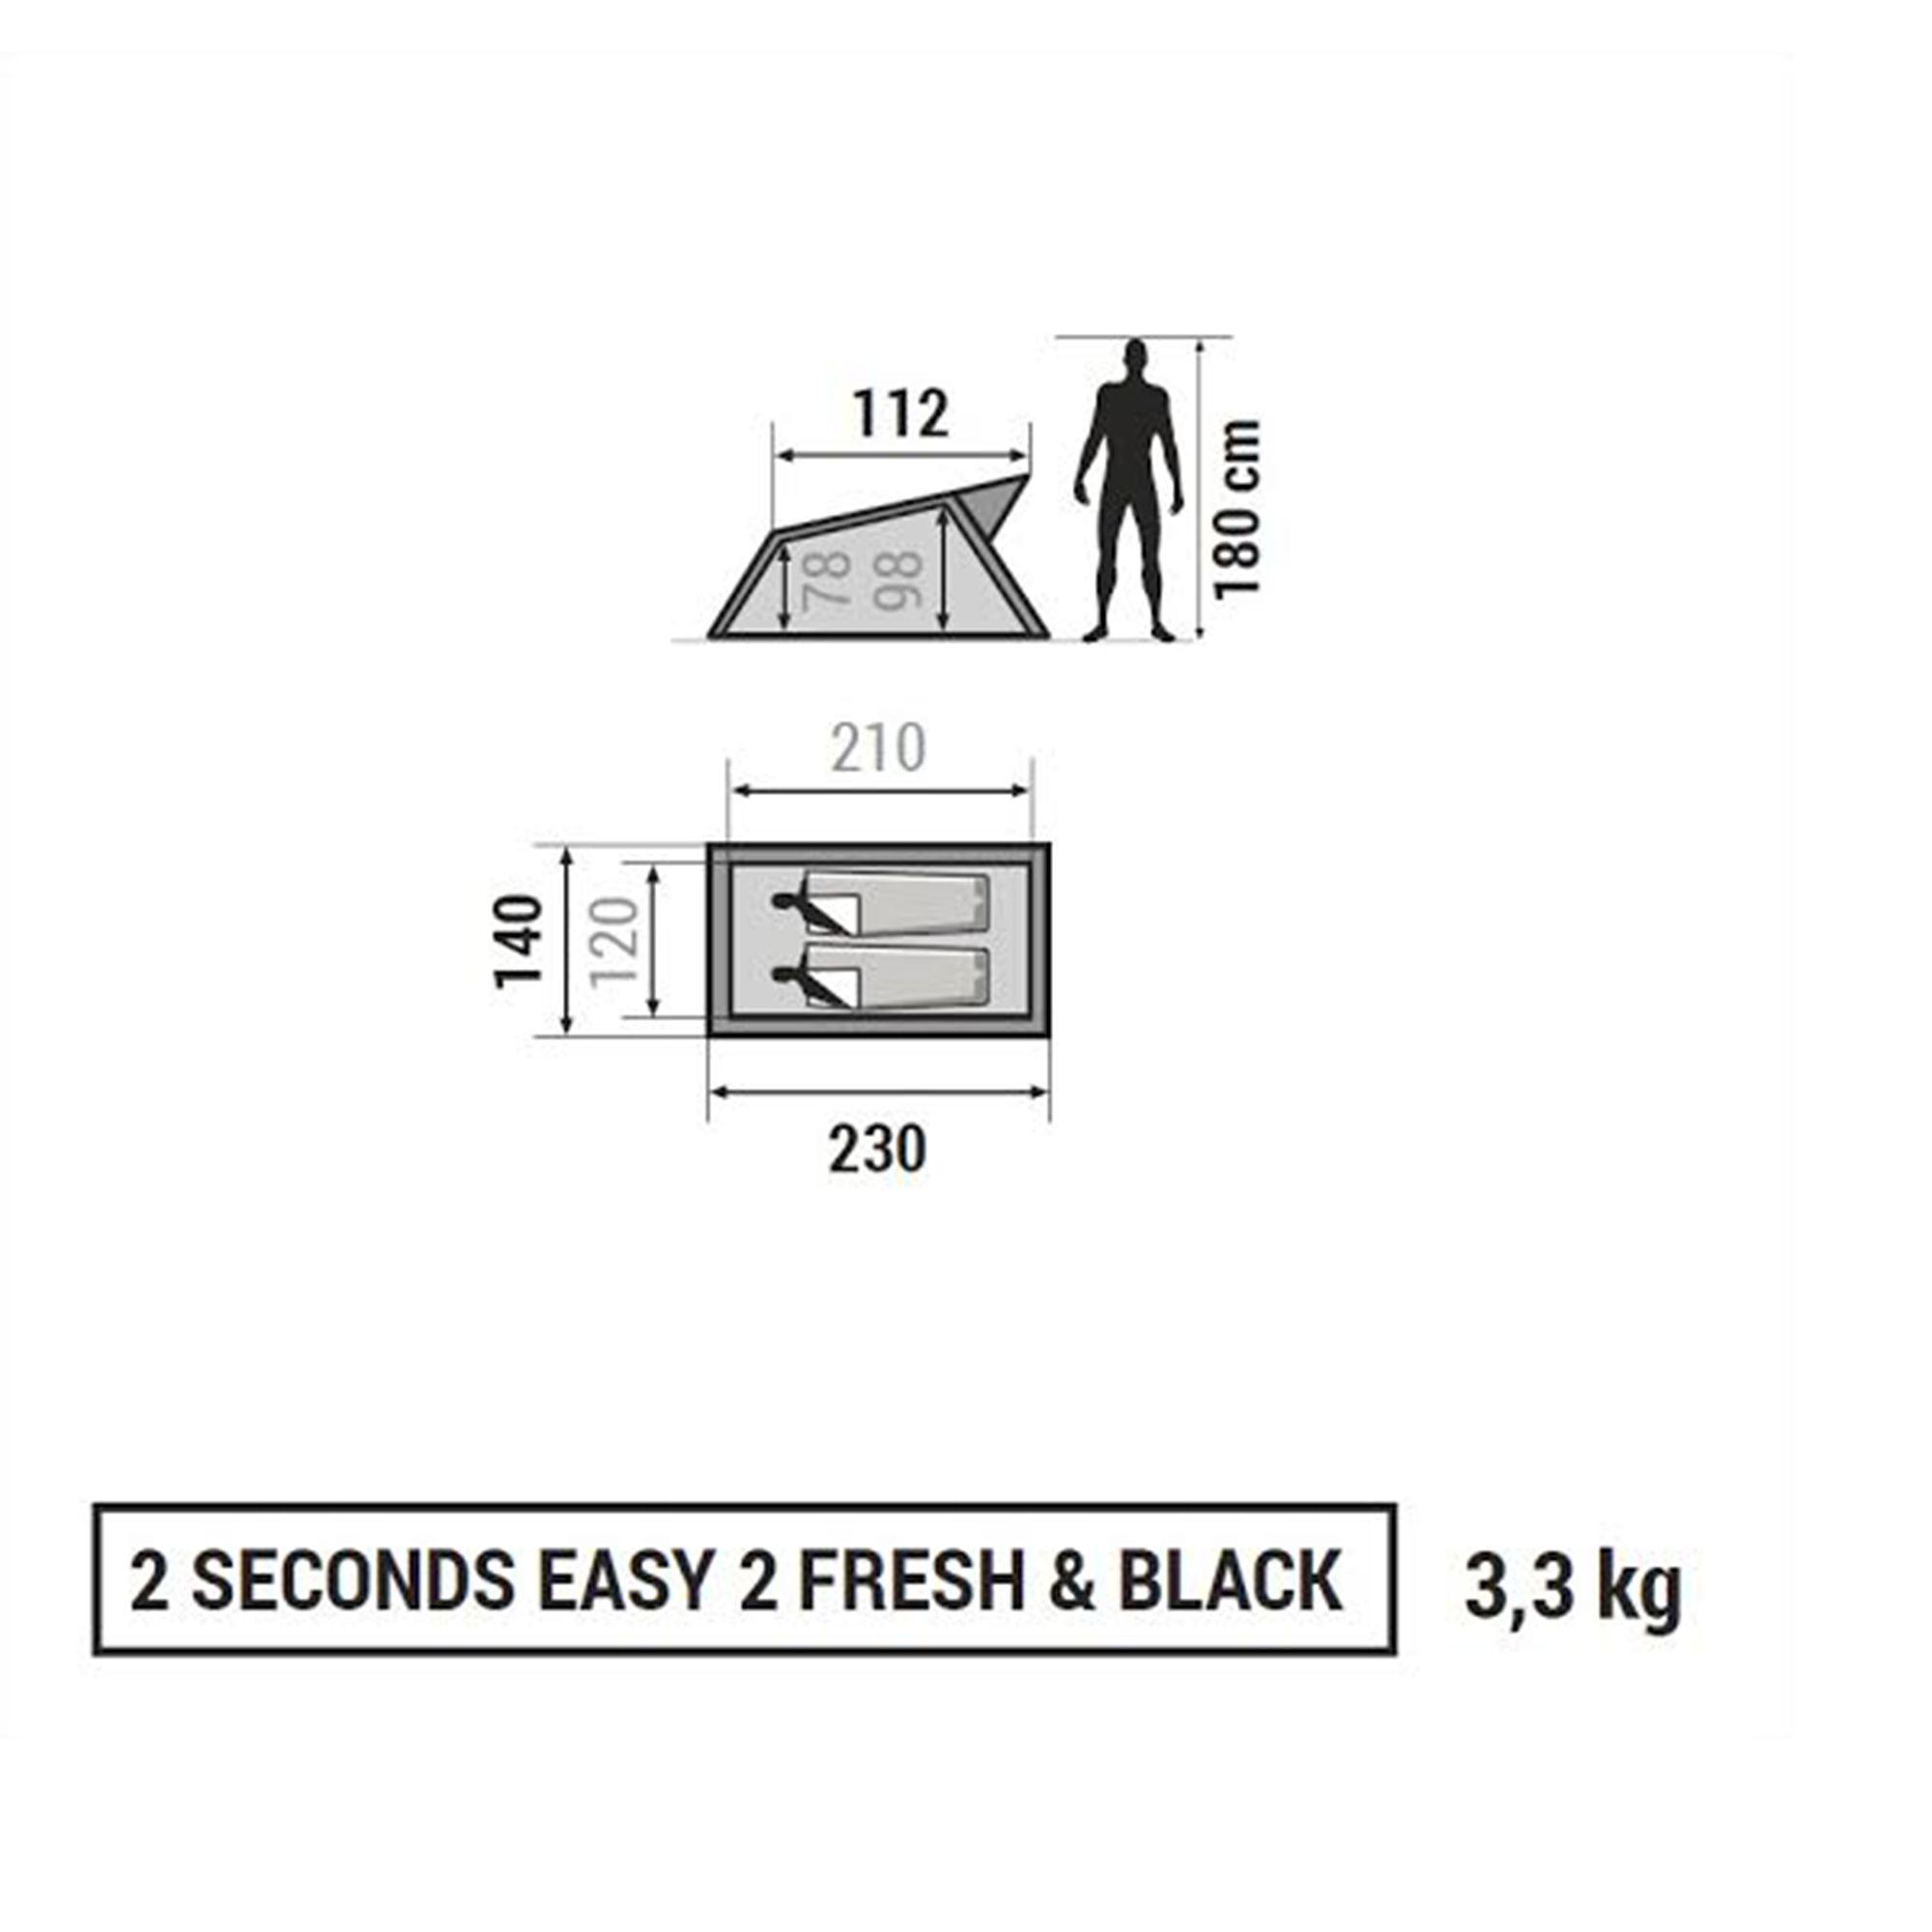 Tente de camping 2 SECONDS 2 FRESH&BLACK   2 personnes blanche